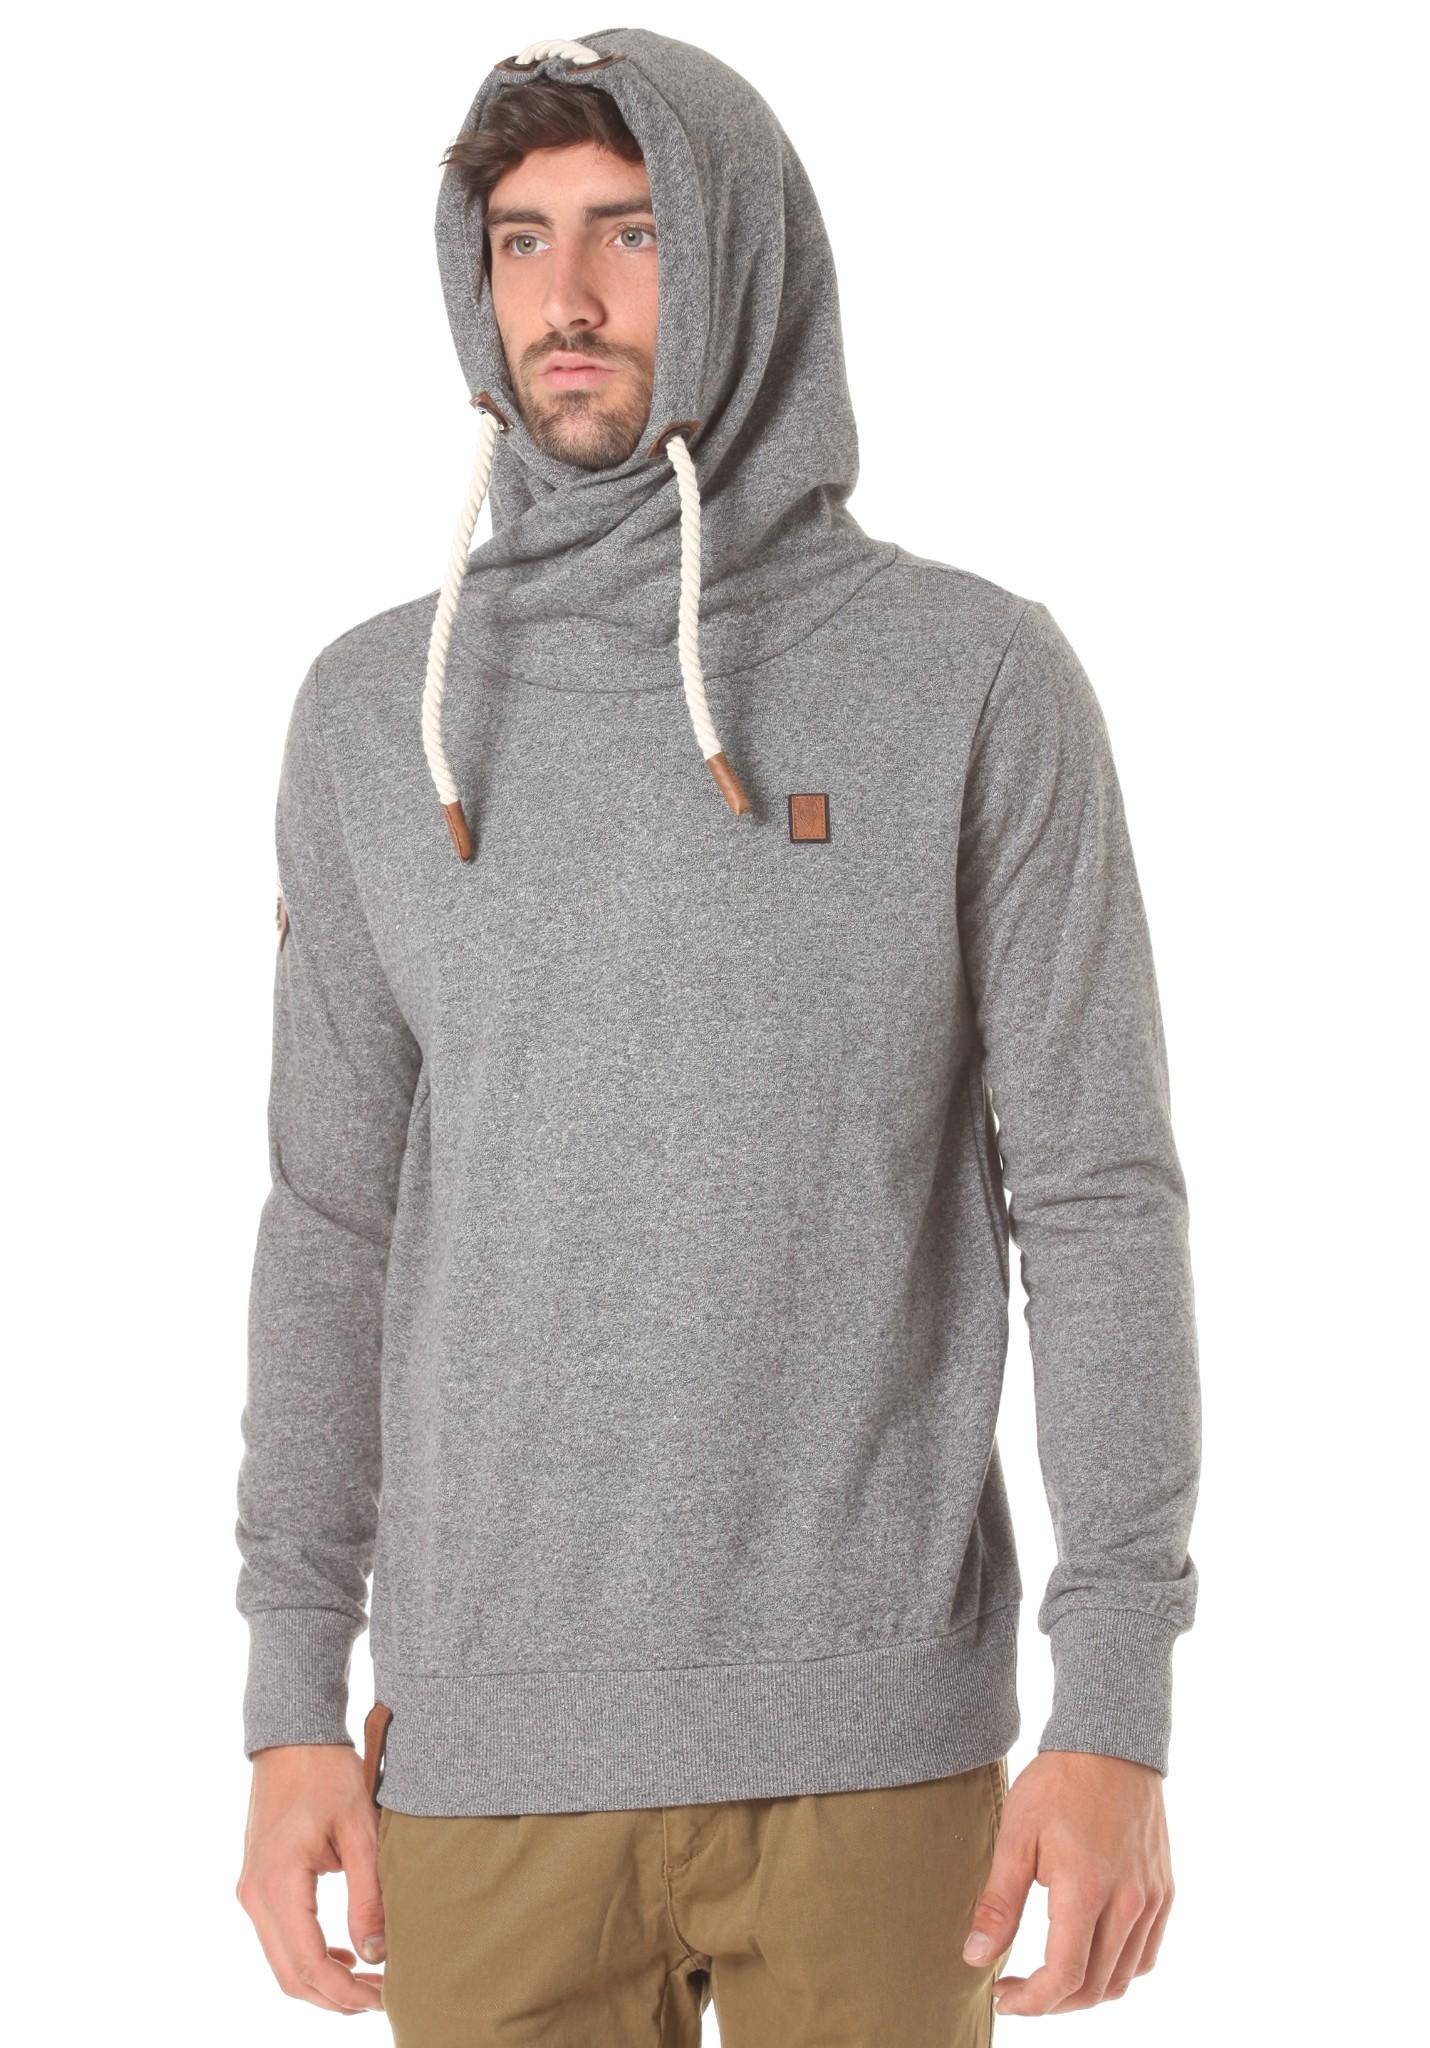 neu naketano olaf gonzalez herren kapuzenpullover pullover hoodie kapuzenjacke ebay. Black Bedroom Furniture Sets. Home Design Ideas